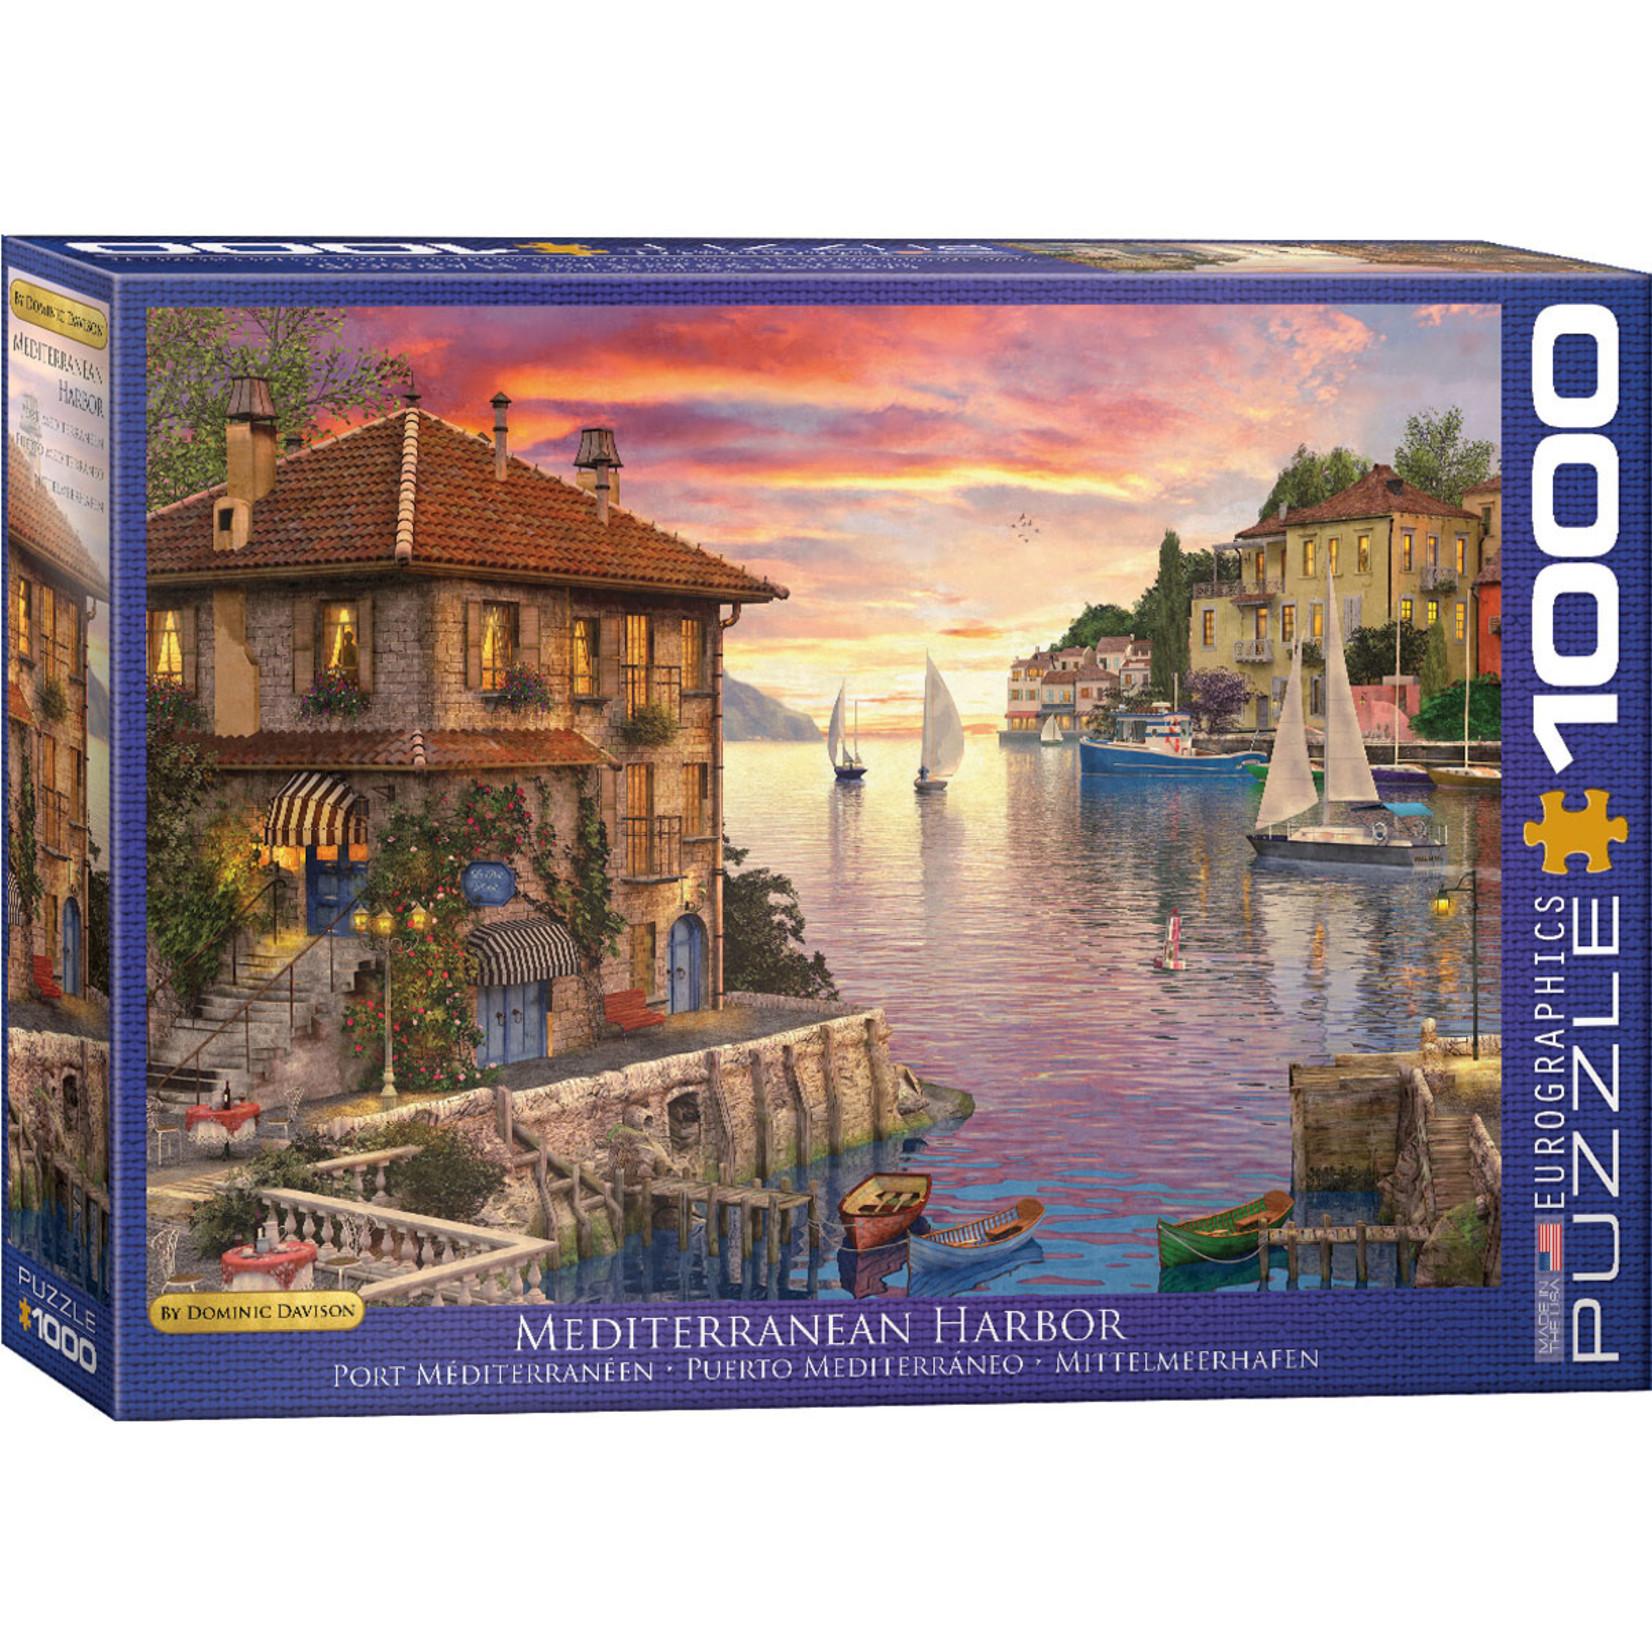 EuroGraphics Puzzles Mediterranean Harbor 1000pc